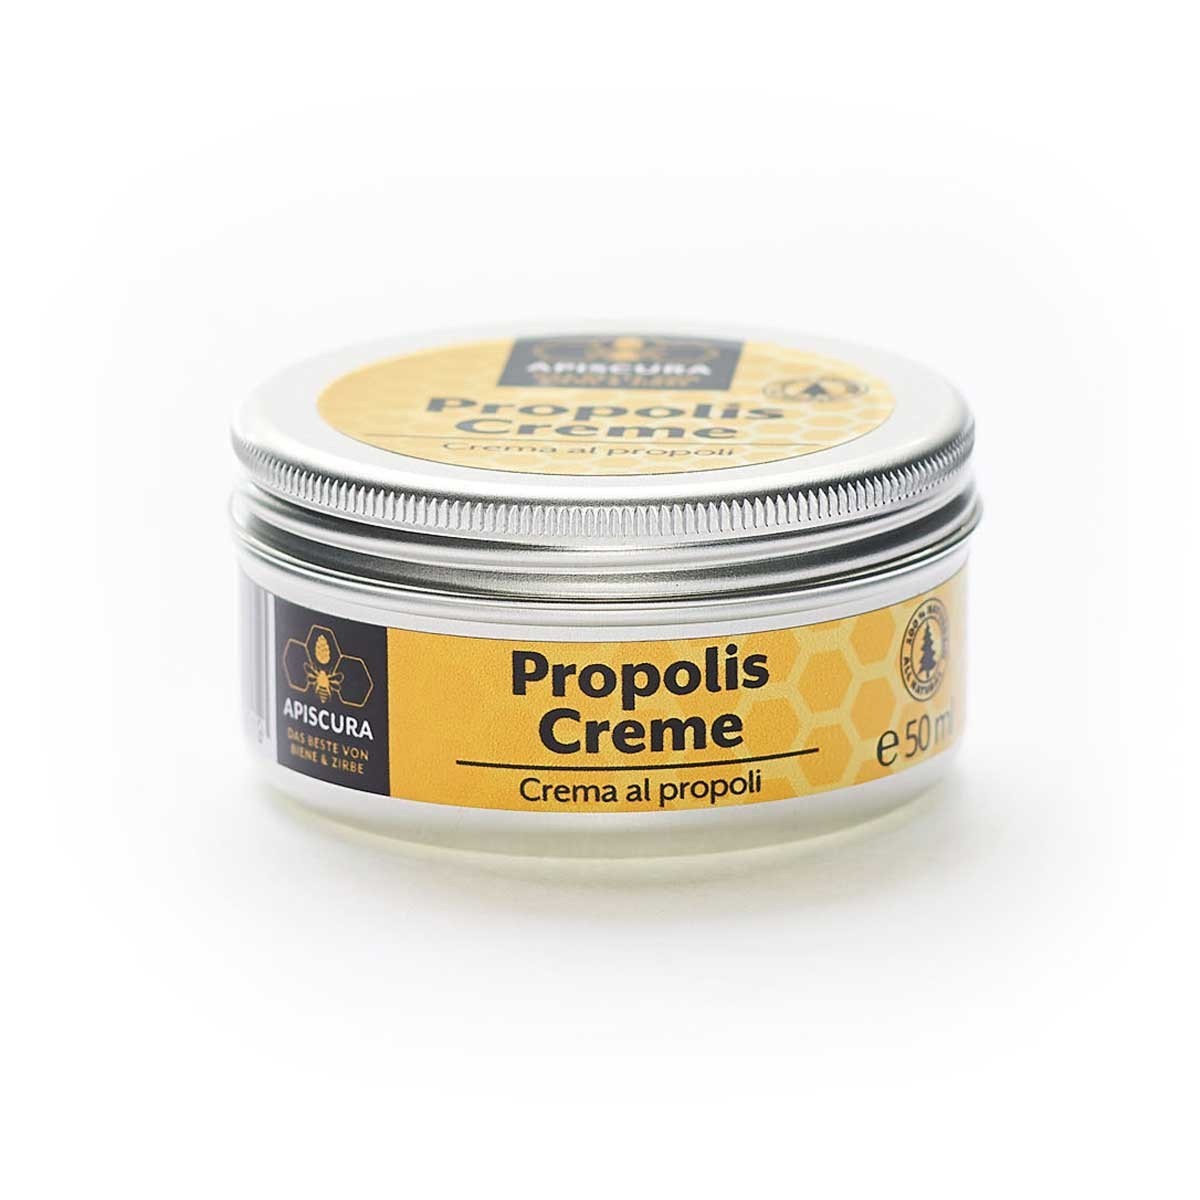 Propolis Creme 50ml APISCURA